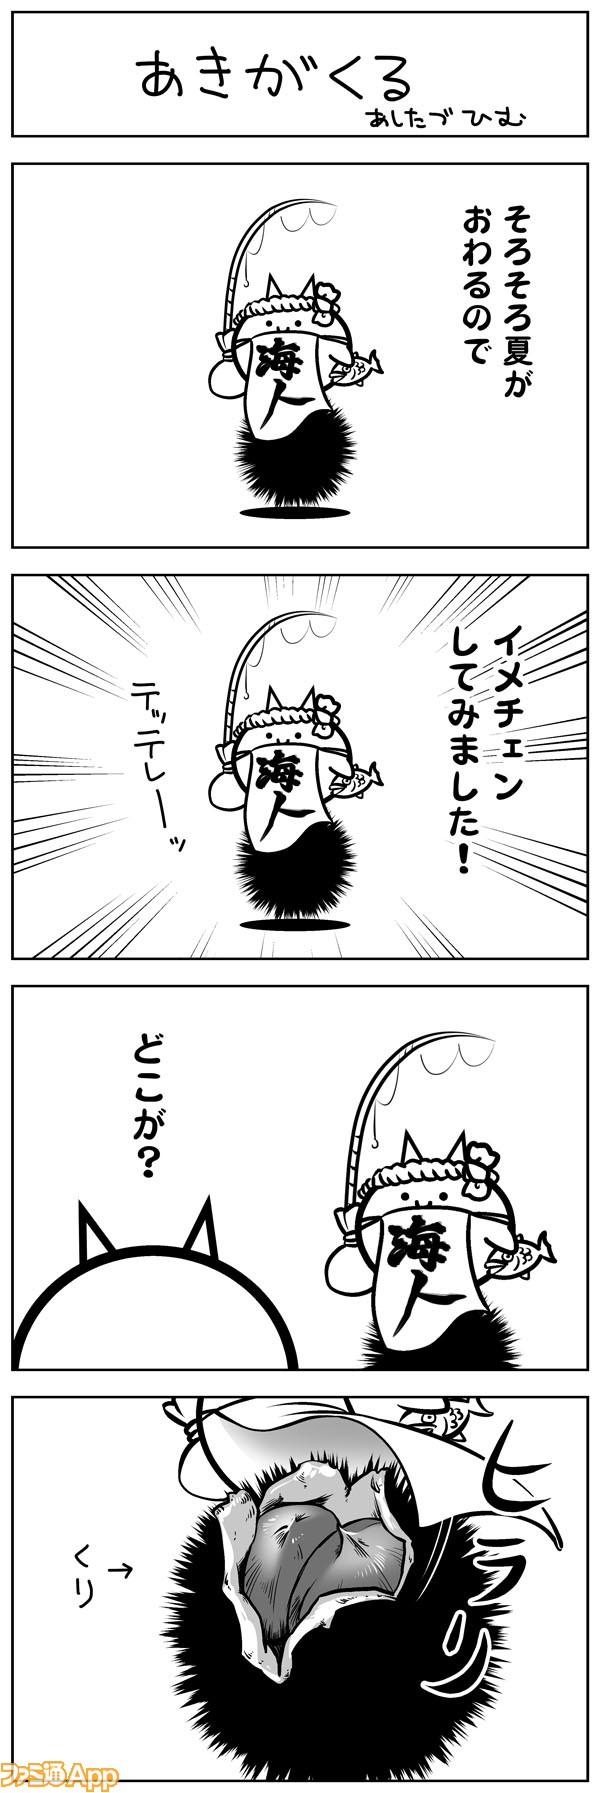 08asit_041